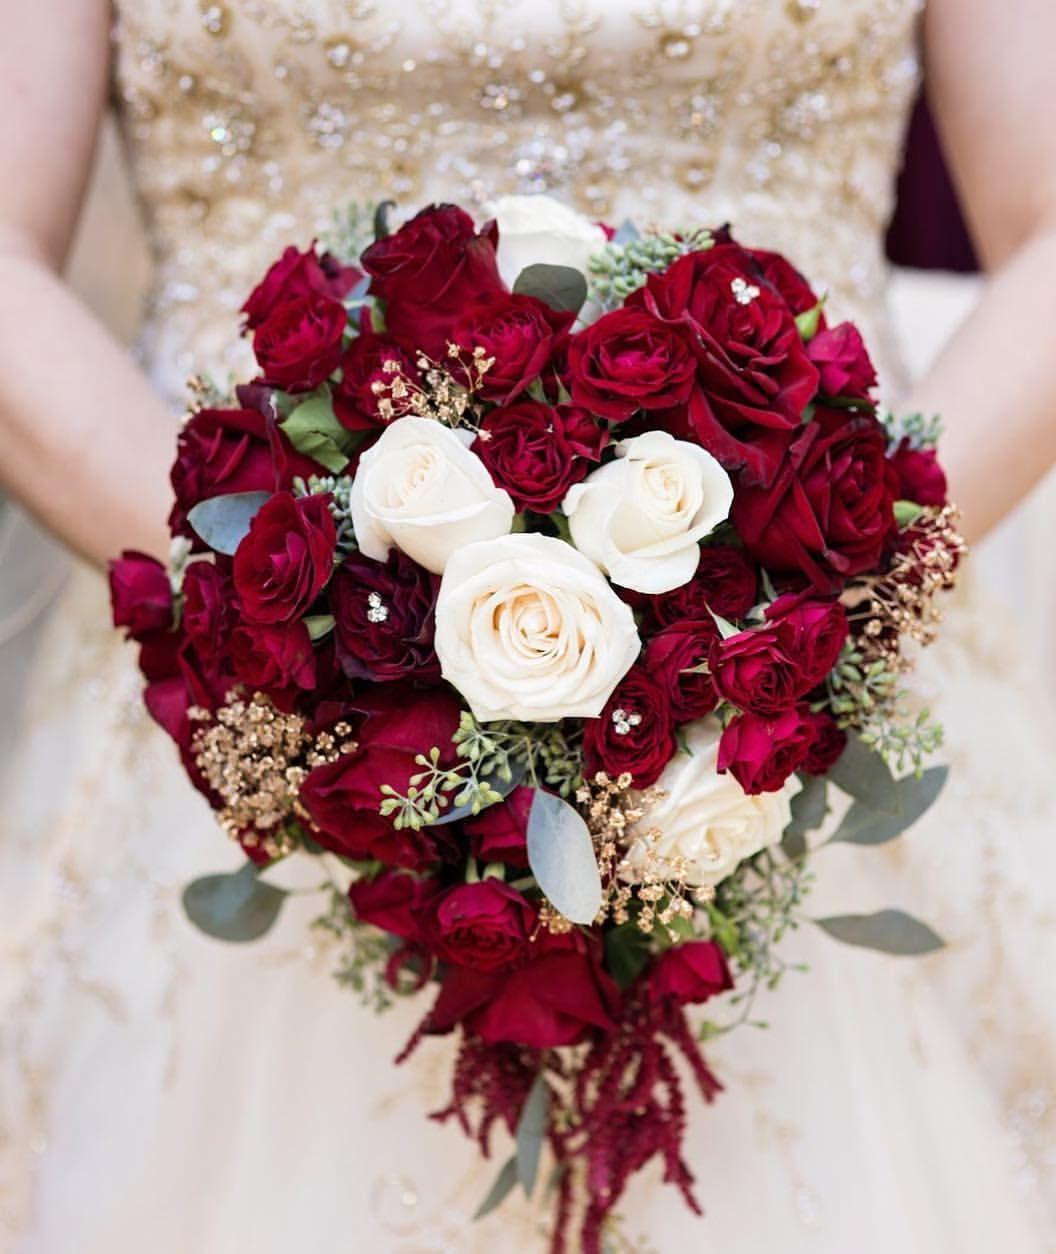 25 Unique Wedding Ideas To Get Inspire: @disneyweddings On Instagram